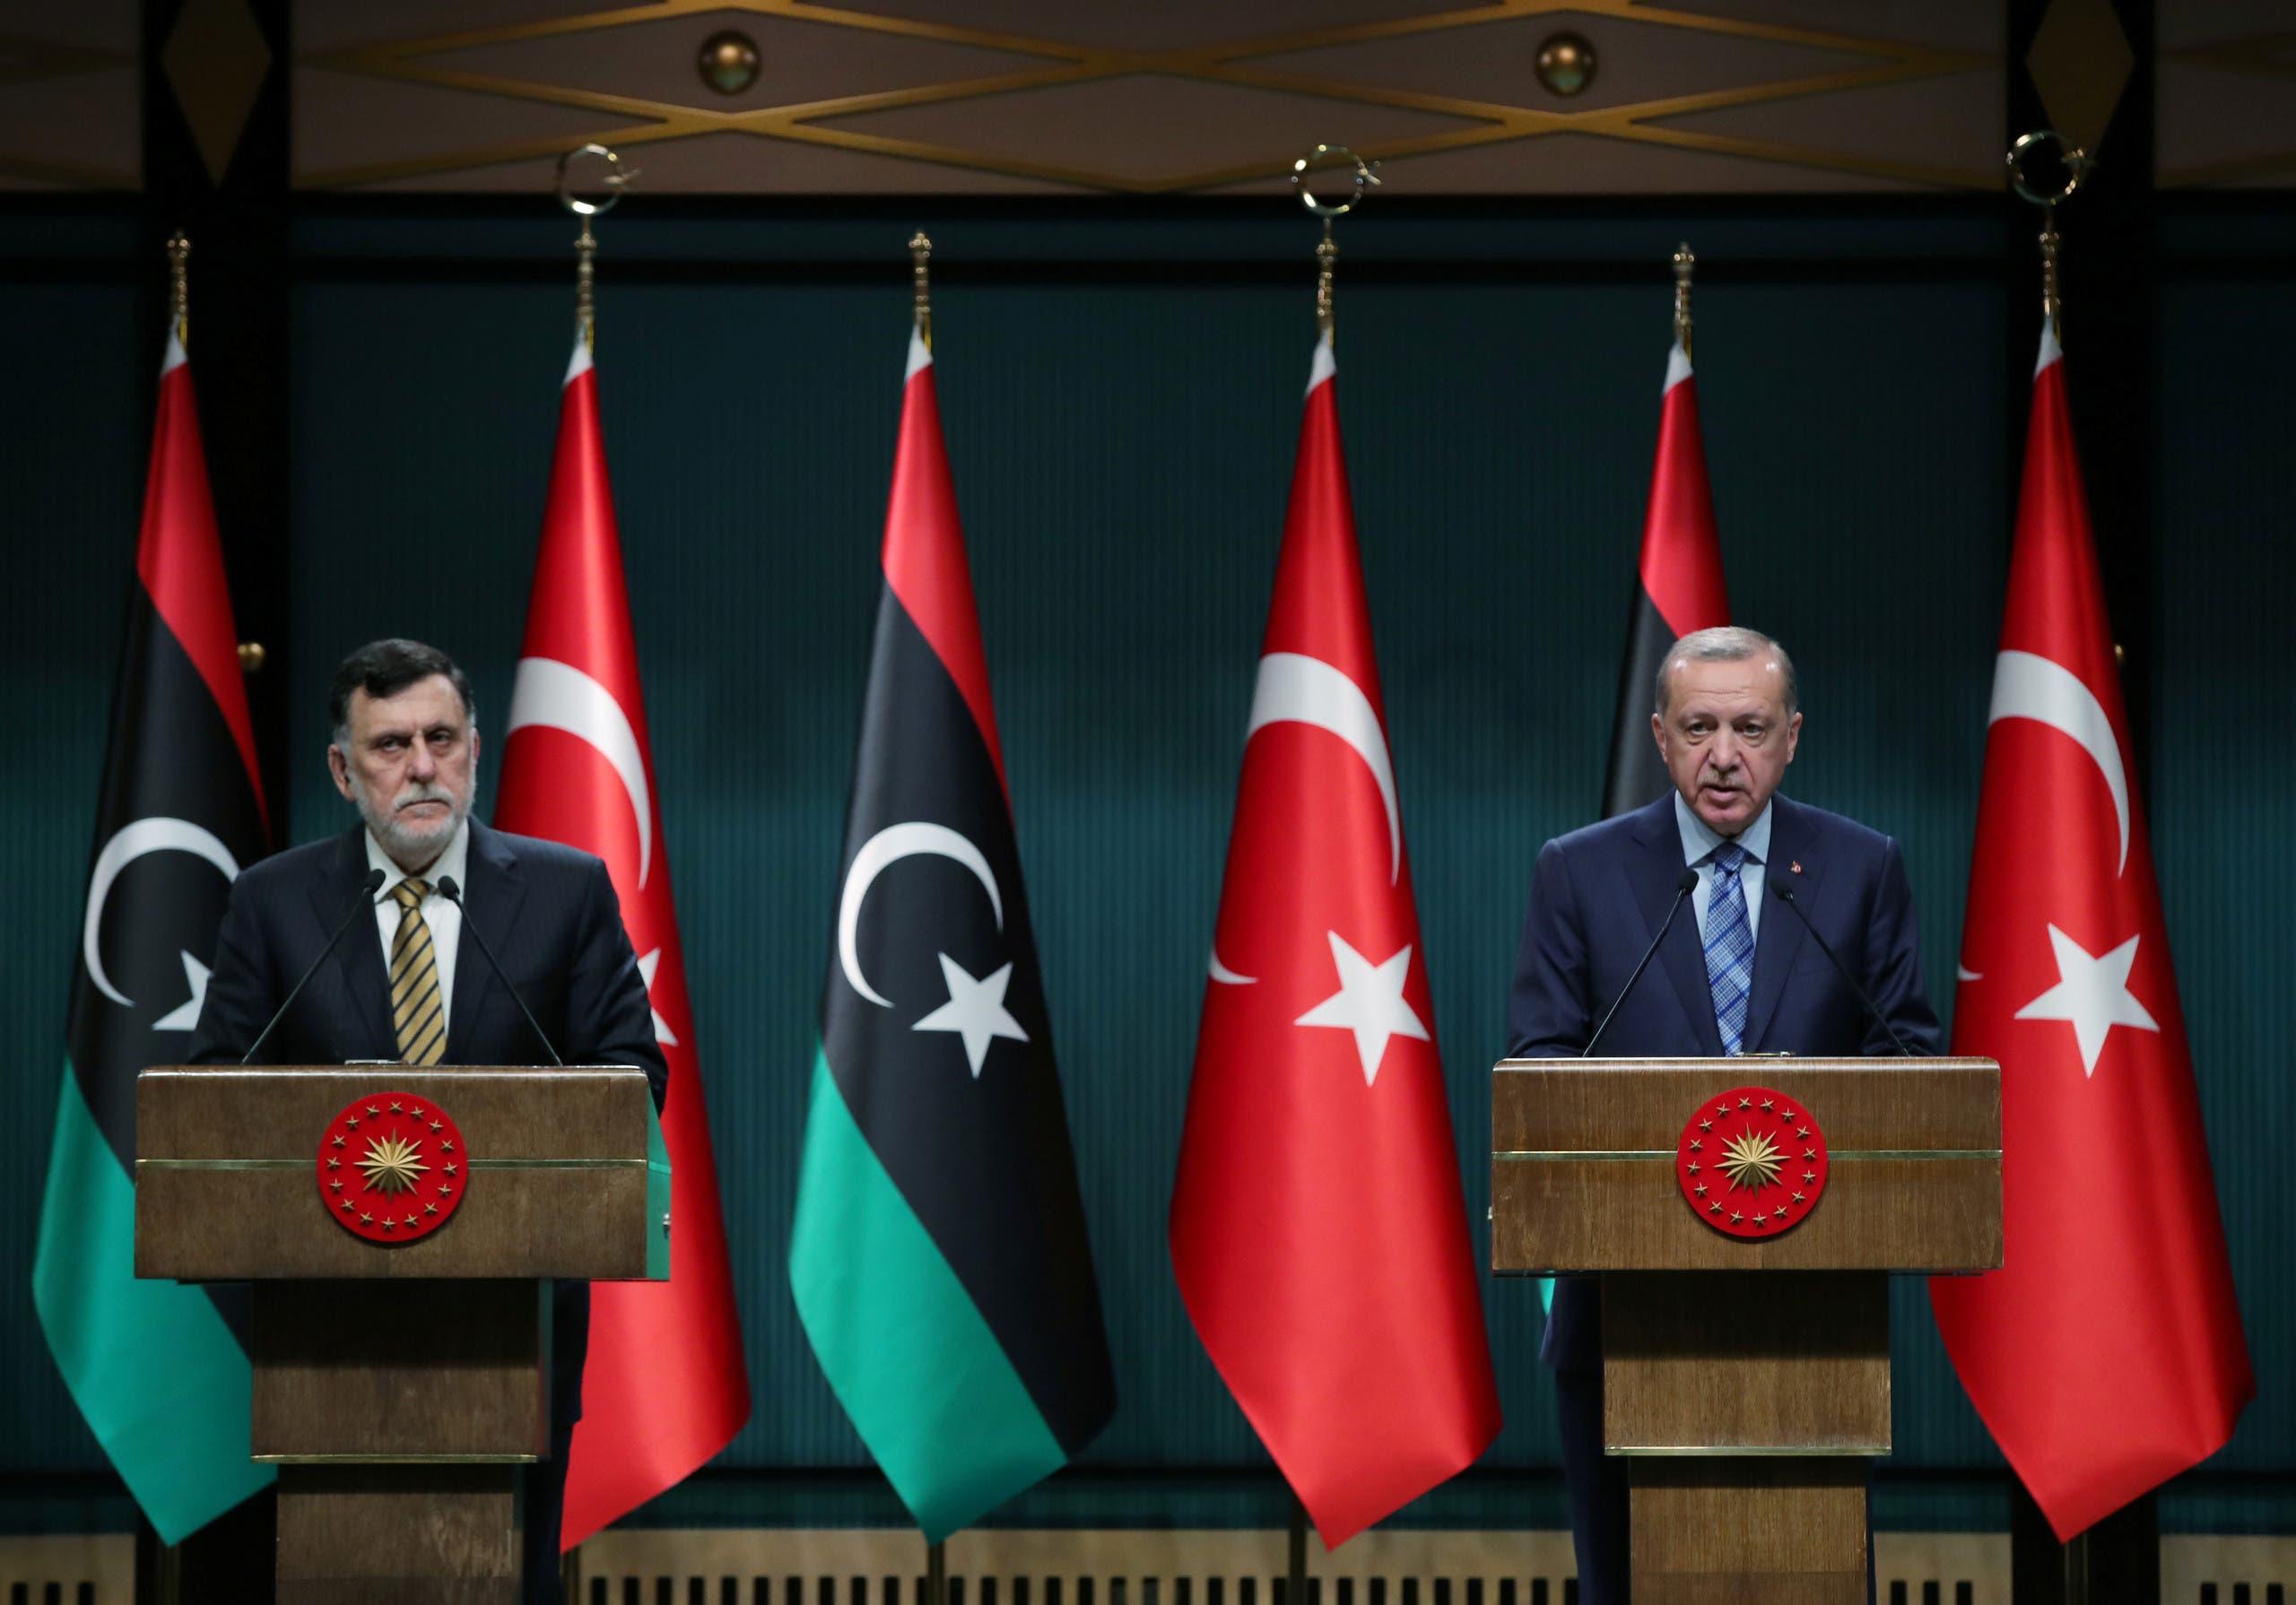 Libya's UN-recognized Prime Minister Fayez al-Serraj is seen with Turkey's President Erdogan during their meeting in Tripoli, Libya. (Reuters)